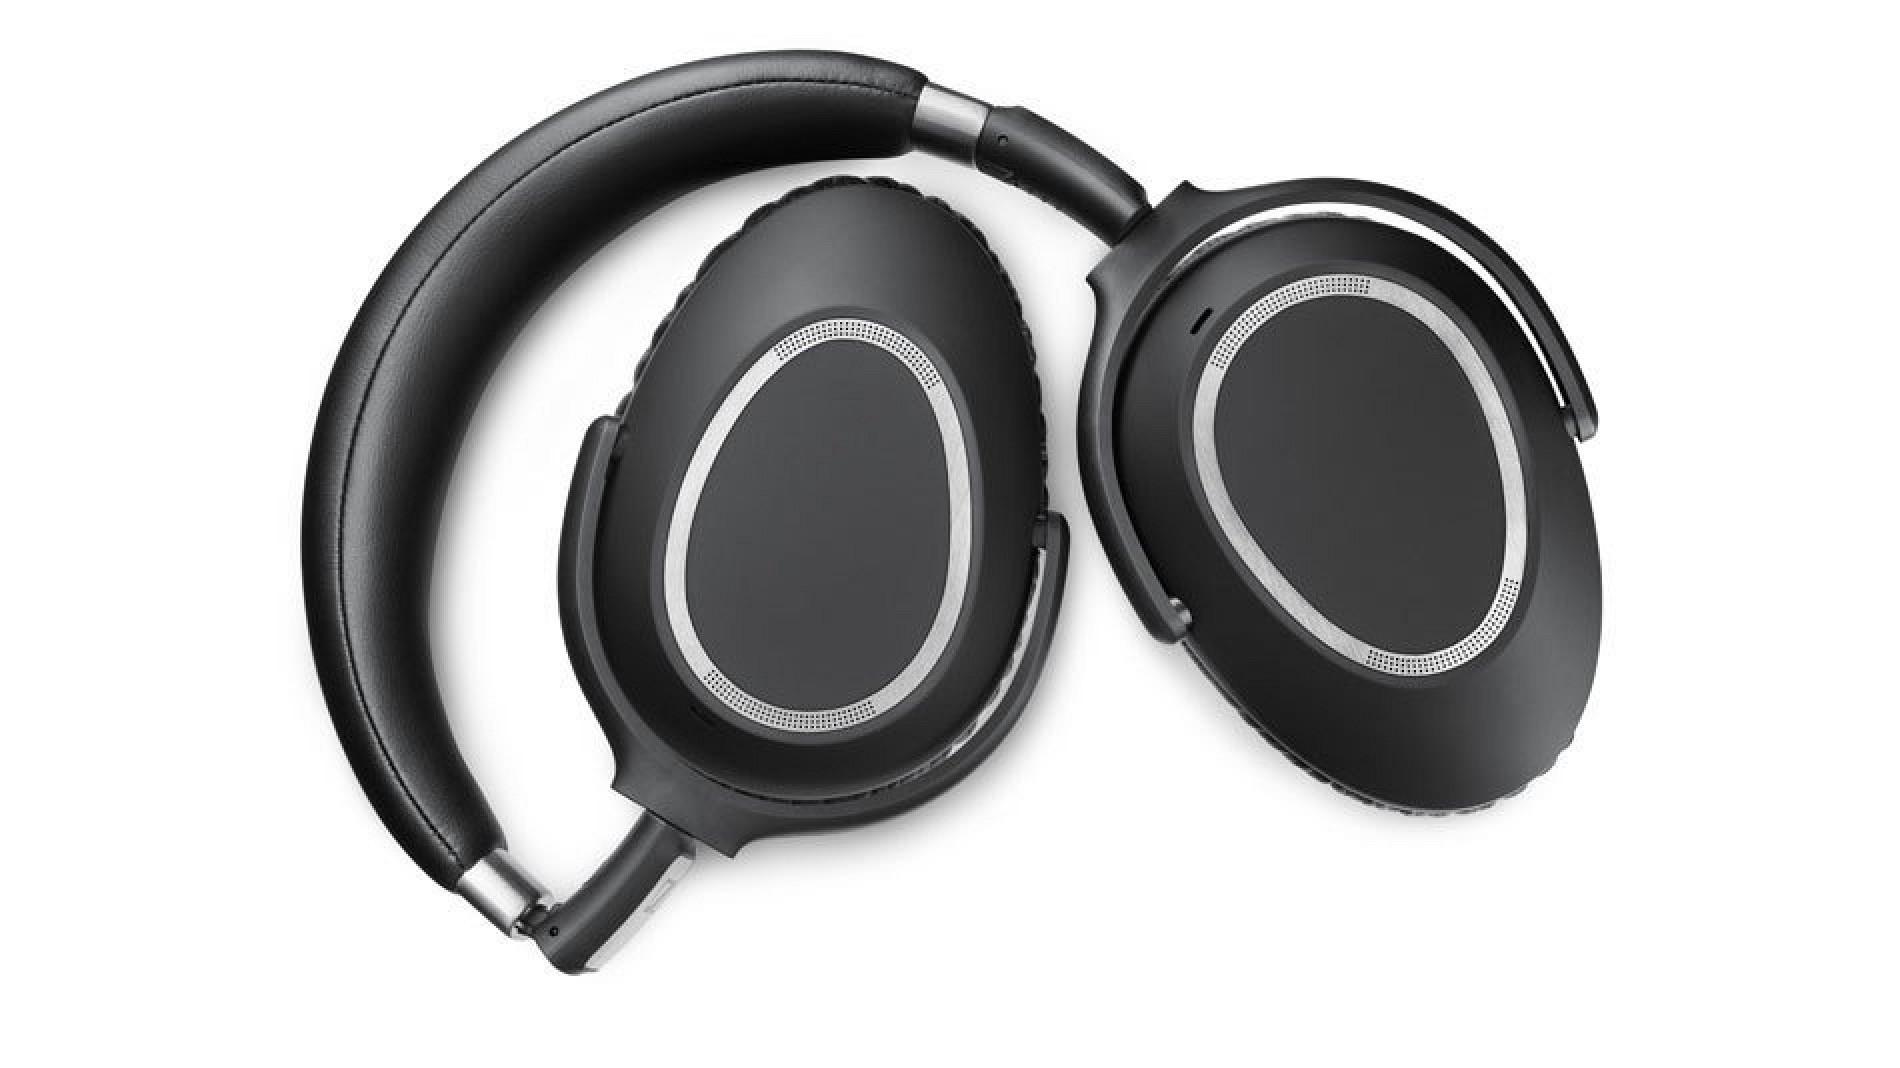 Review: Sennheiser's PXC 550 Wireless Headphones Should Put Bose on